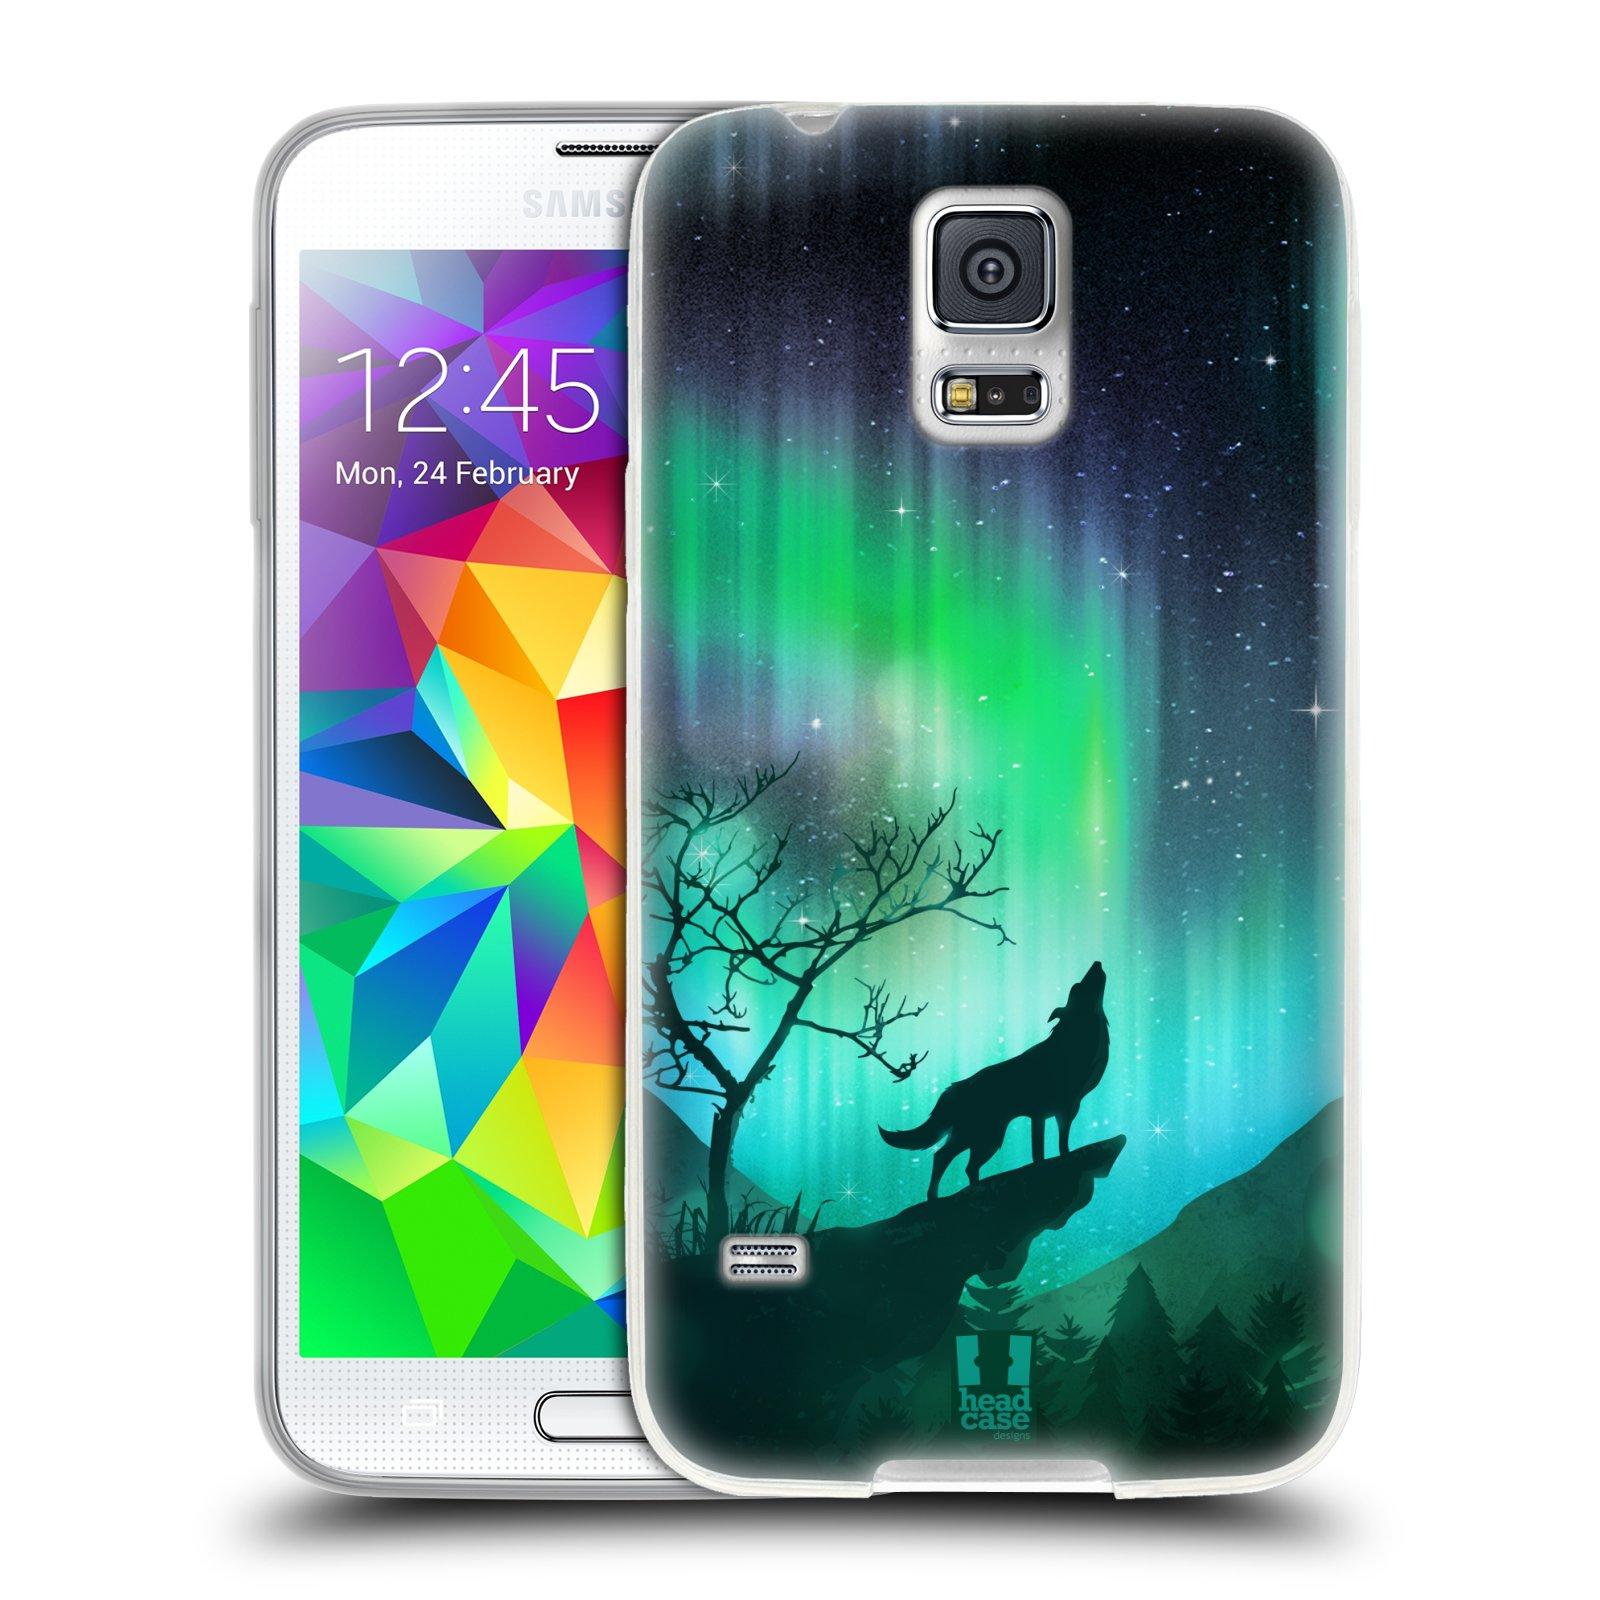 Silikonové pouzdro na mobil Samsung Galaxy S5 HEAD CASE Polární Záře Vlk (Silikonový kryt či obal na mobilní telefon Samsung Galaxy S5 SM-G900F)